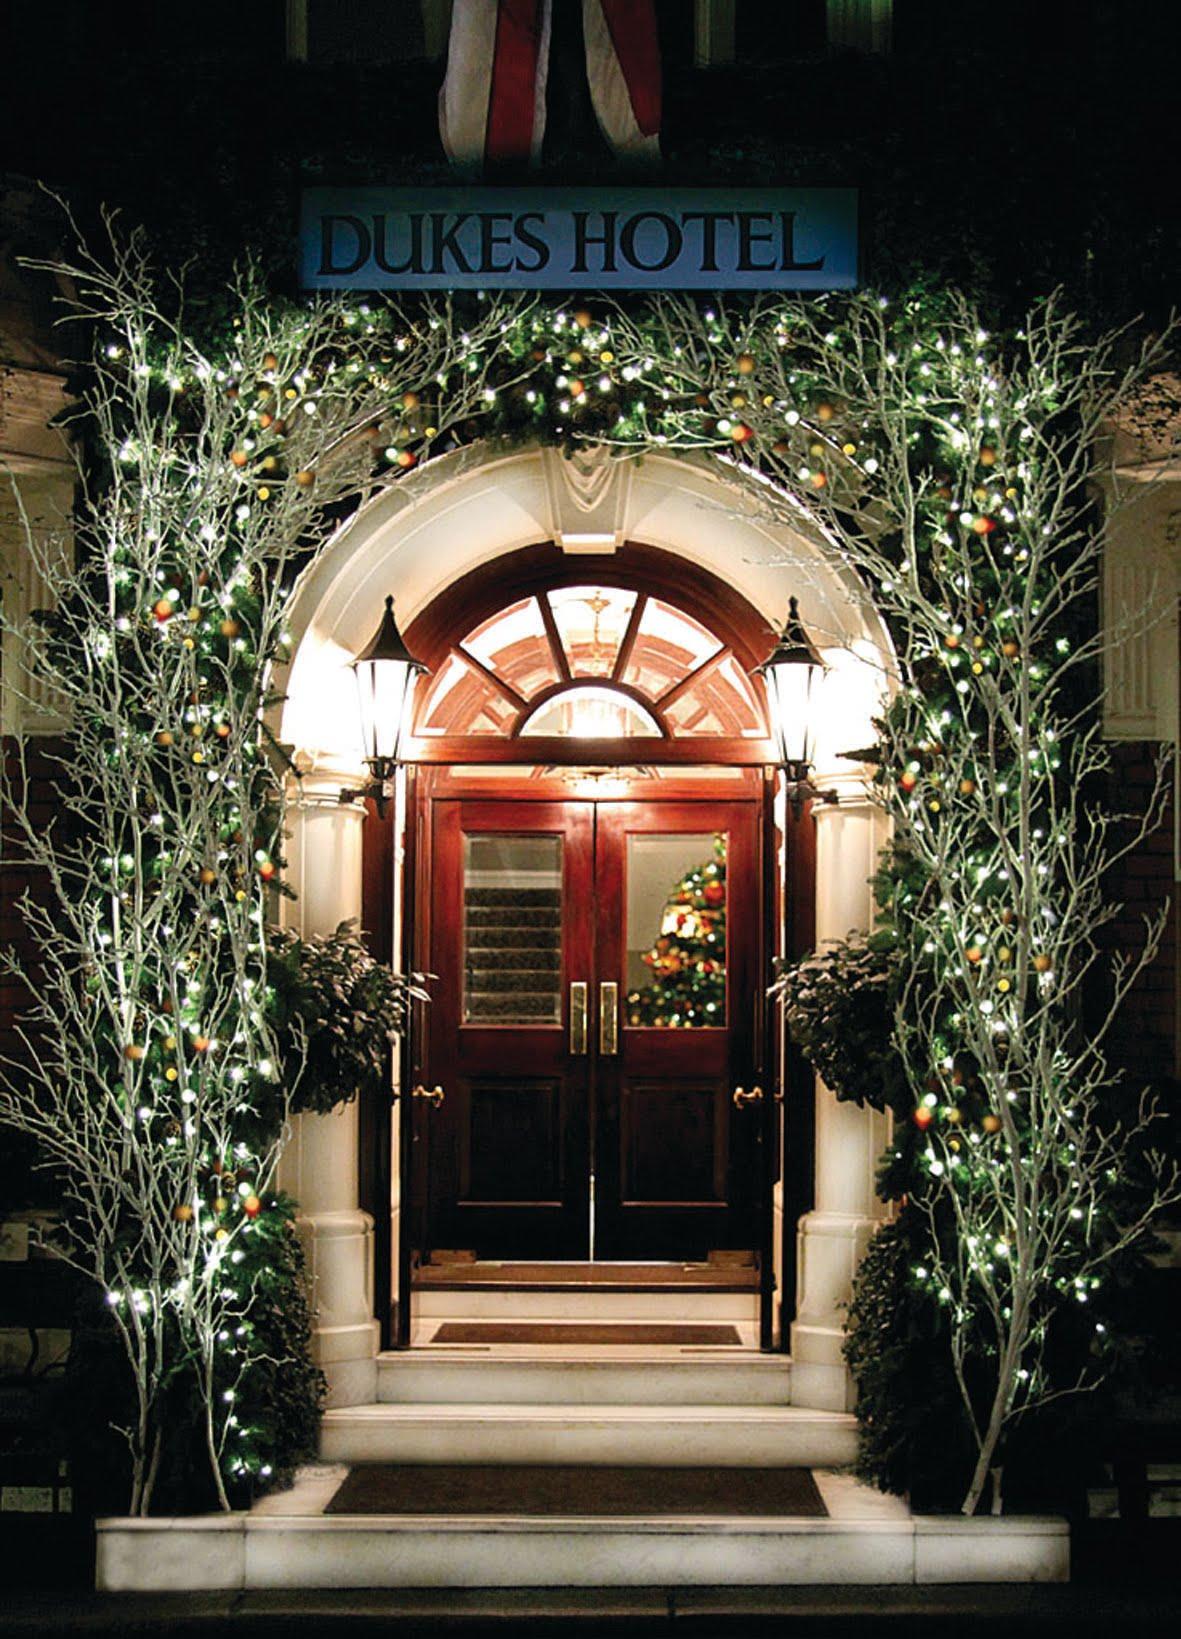 Dukes London hotel Christmas magic: Enjoy festive workshops in luxury surroundings